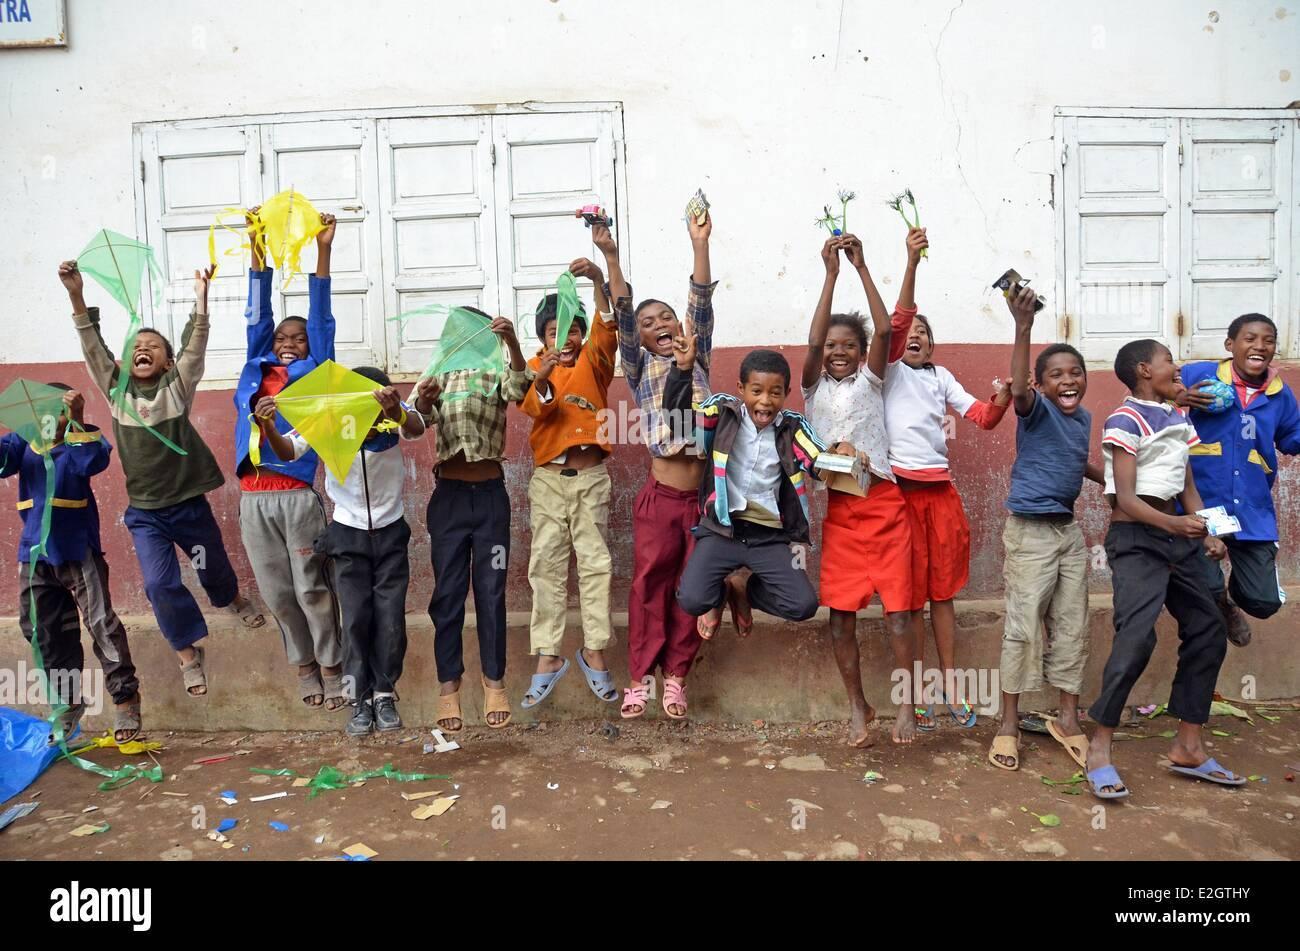 Madagascar Antananarivo schoolchildren jumping in air - Stock Image